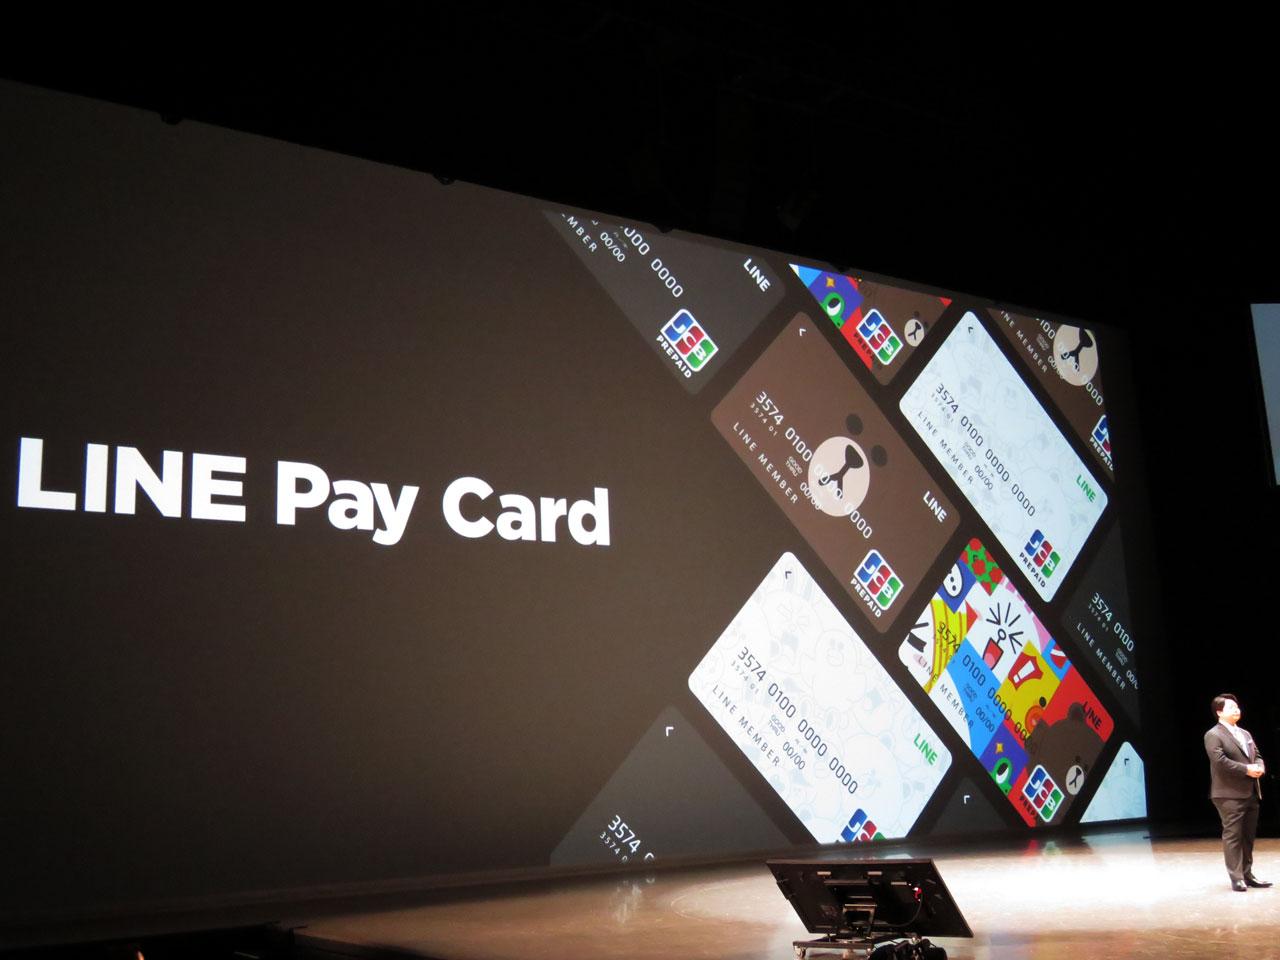 line pay card jcb 2 percent points back lawson